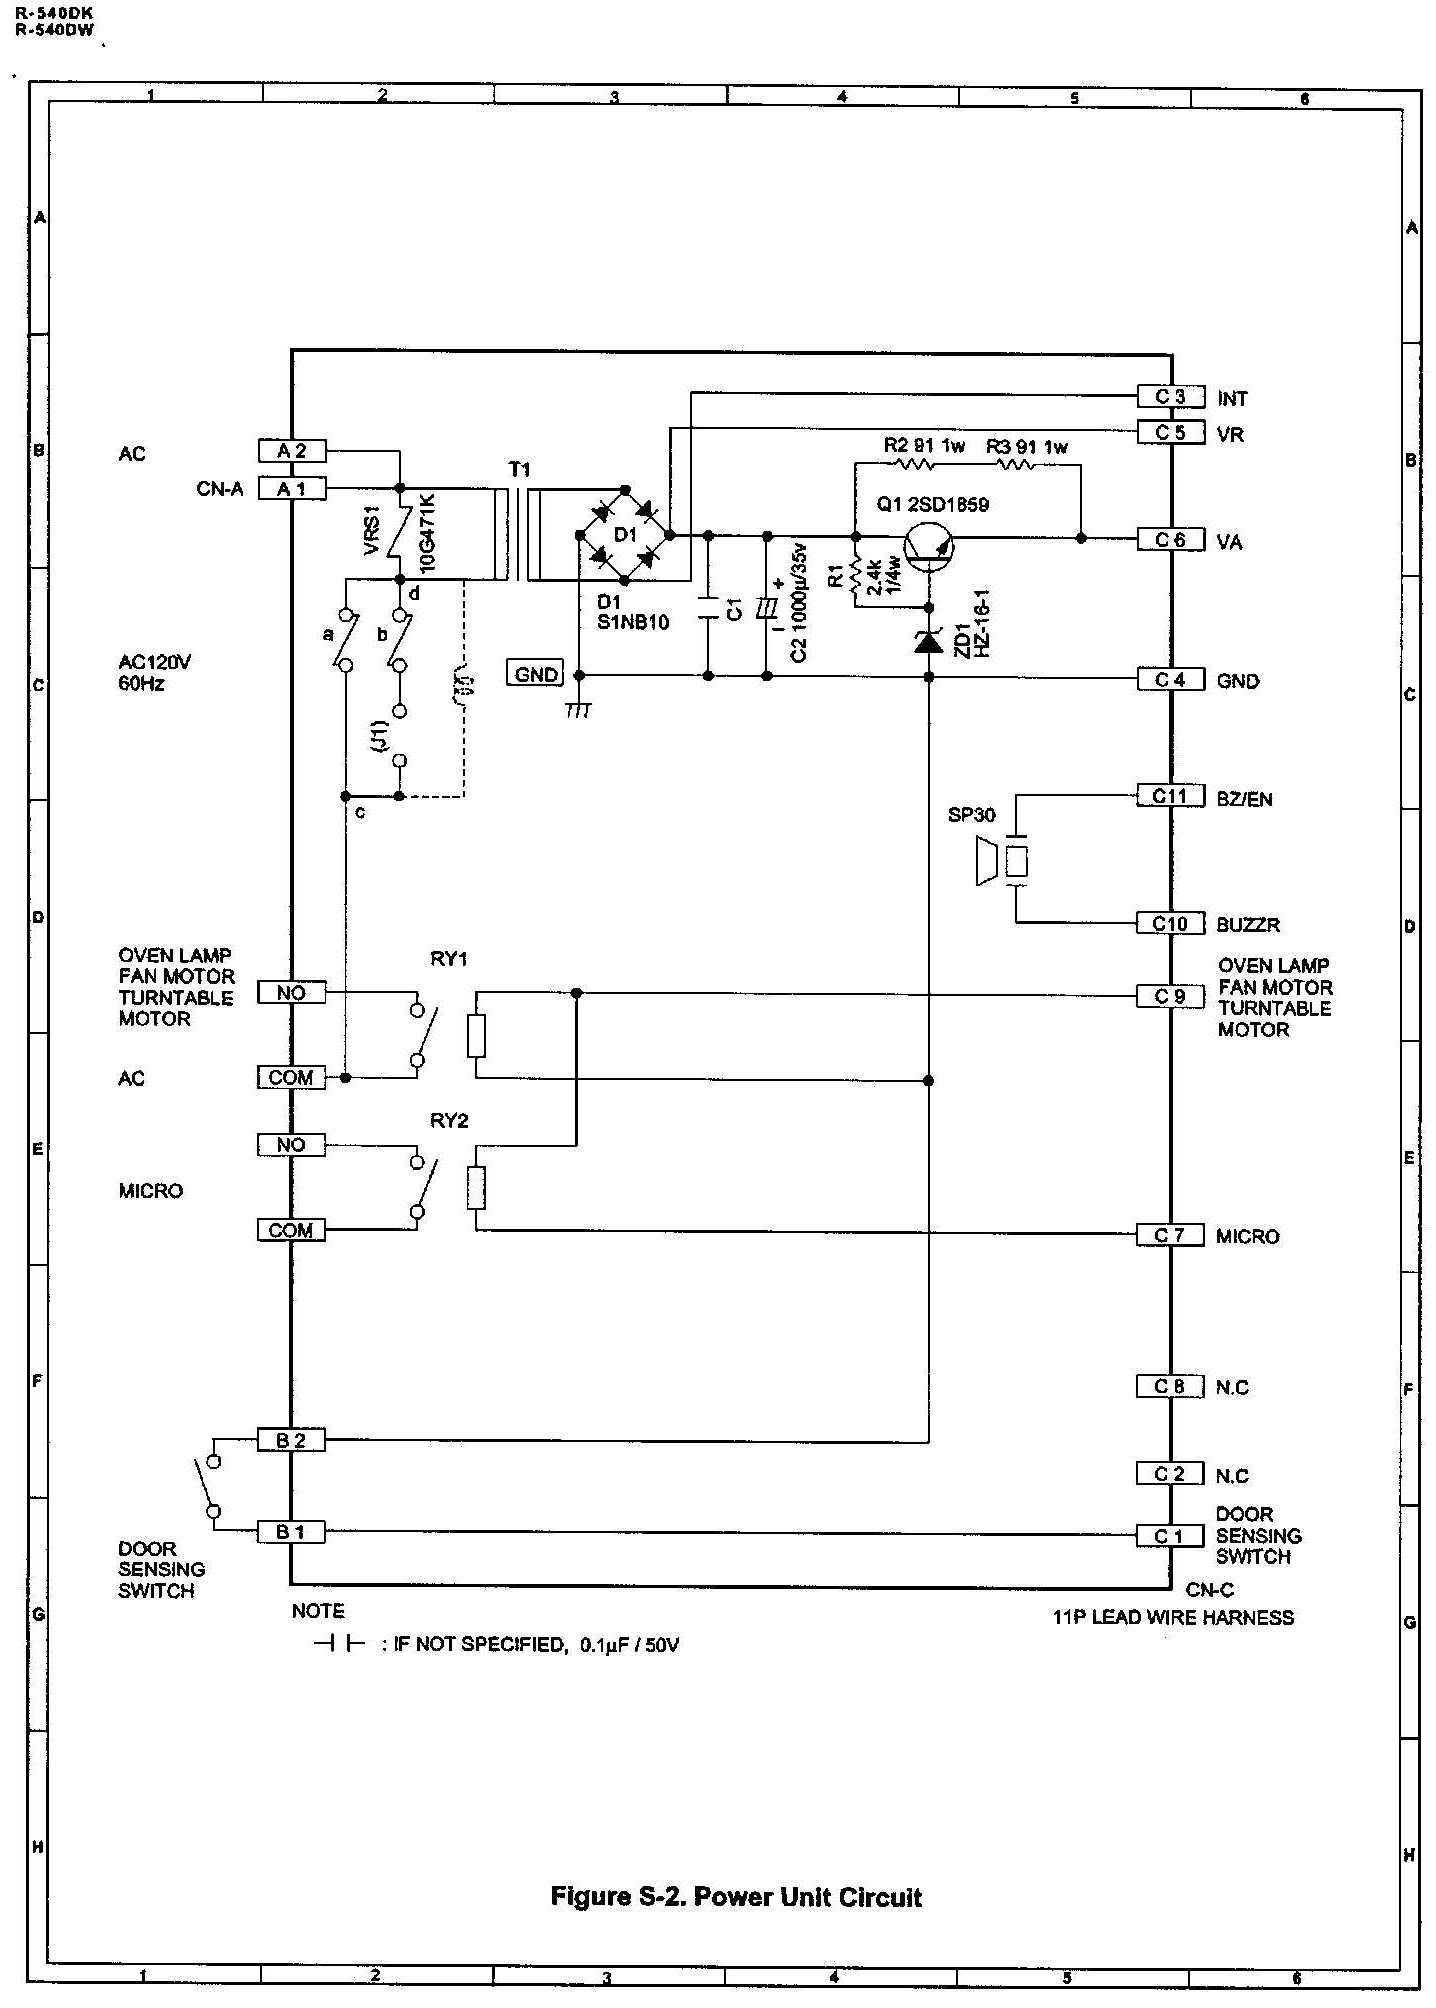 Ge Microwave Wiring Diagram Fuse Diagram 1999 Mitsubishi Eclipse Spyder Cts Lsa Nescafe Cappu Jeanjaures37 Fr